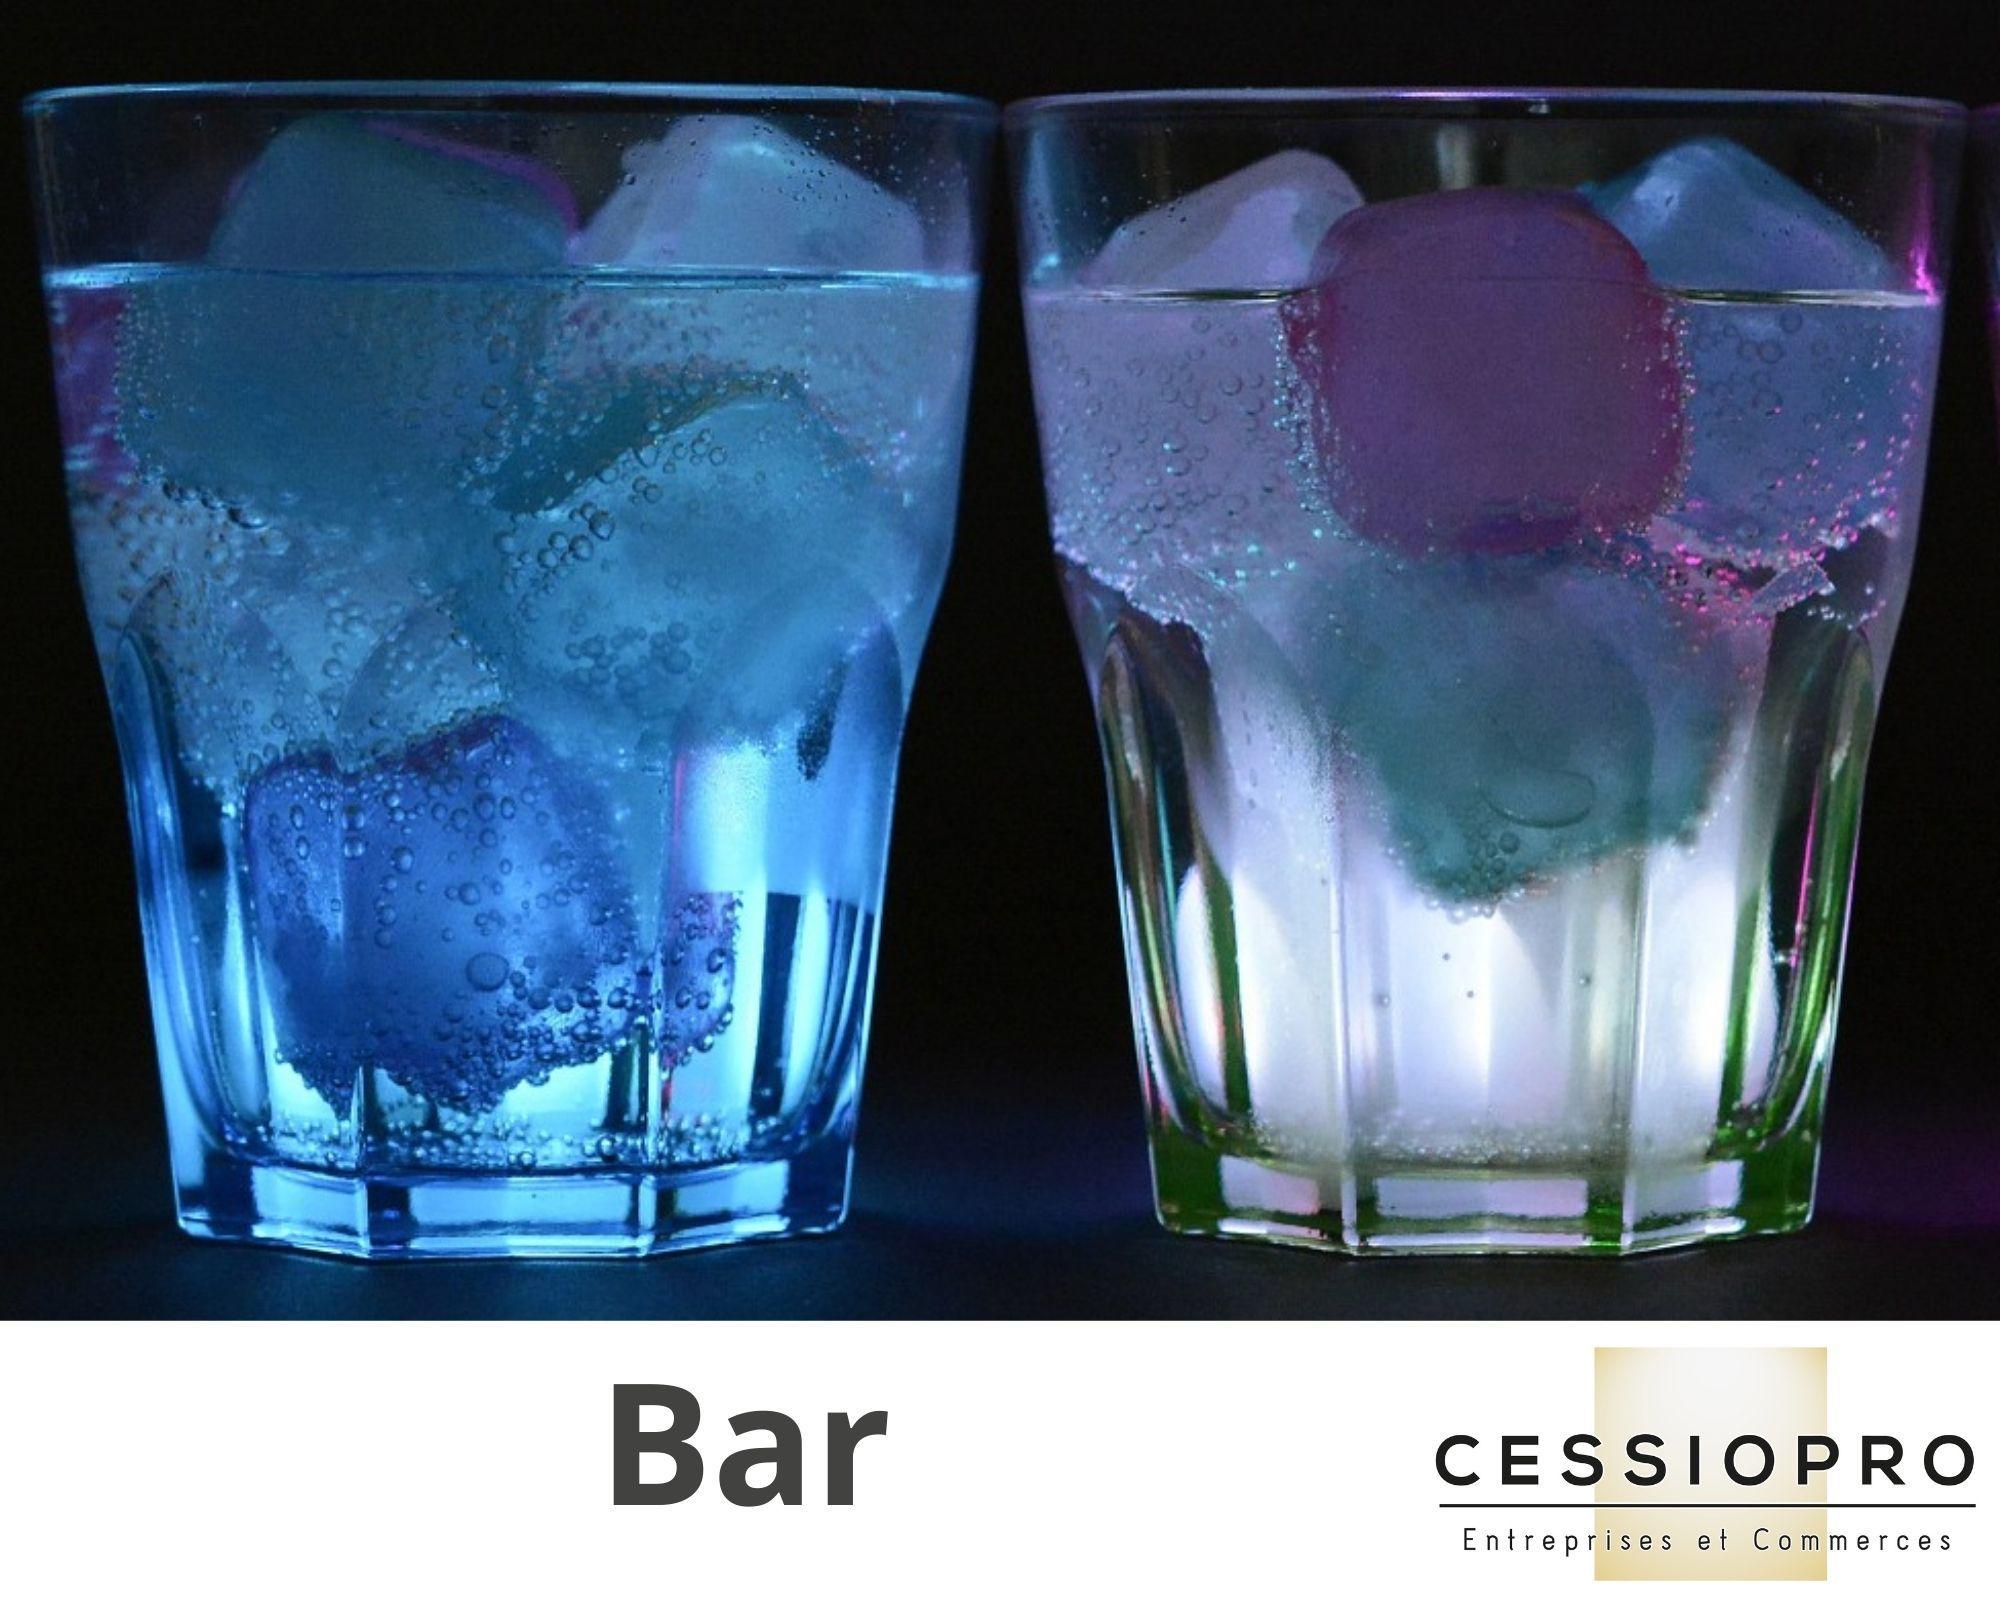 bar licence IV à Cannes La bocca  - Bar Brasserie